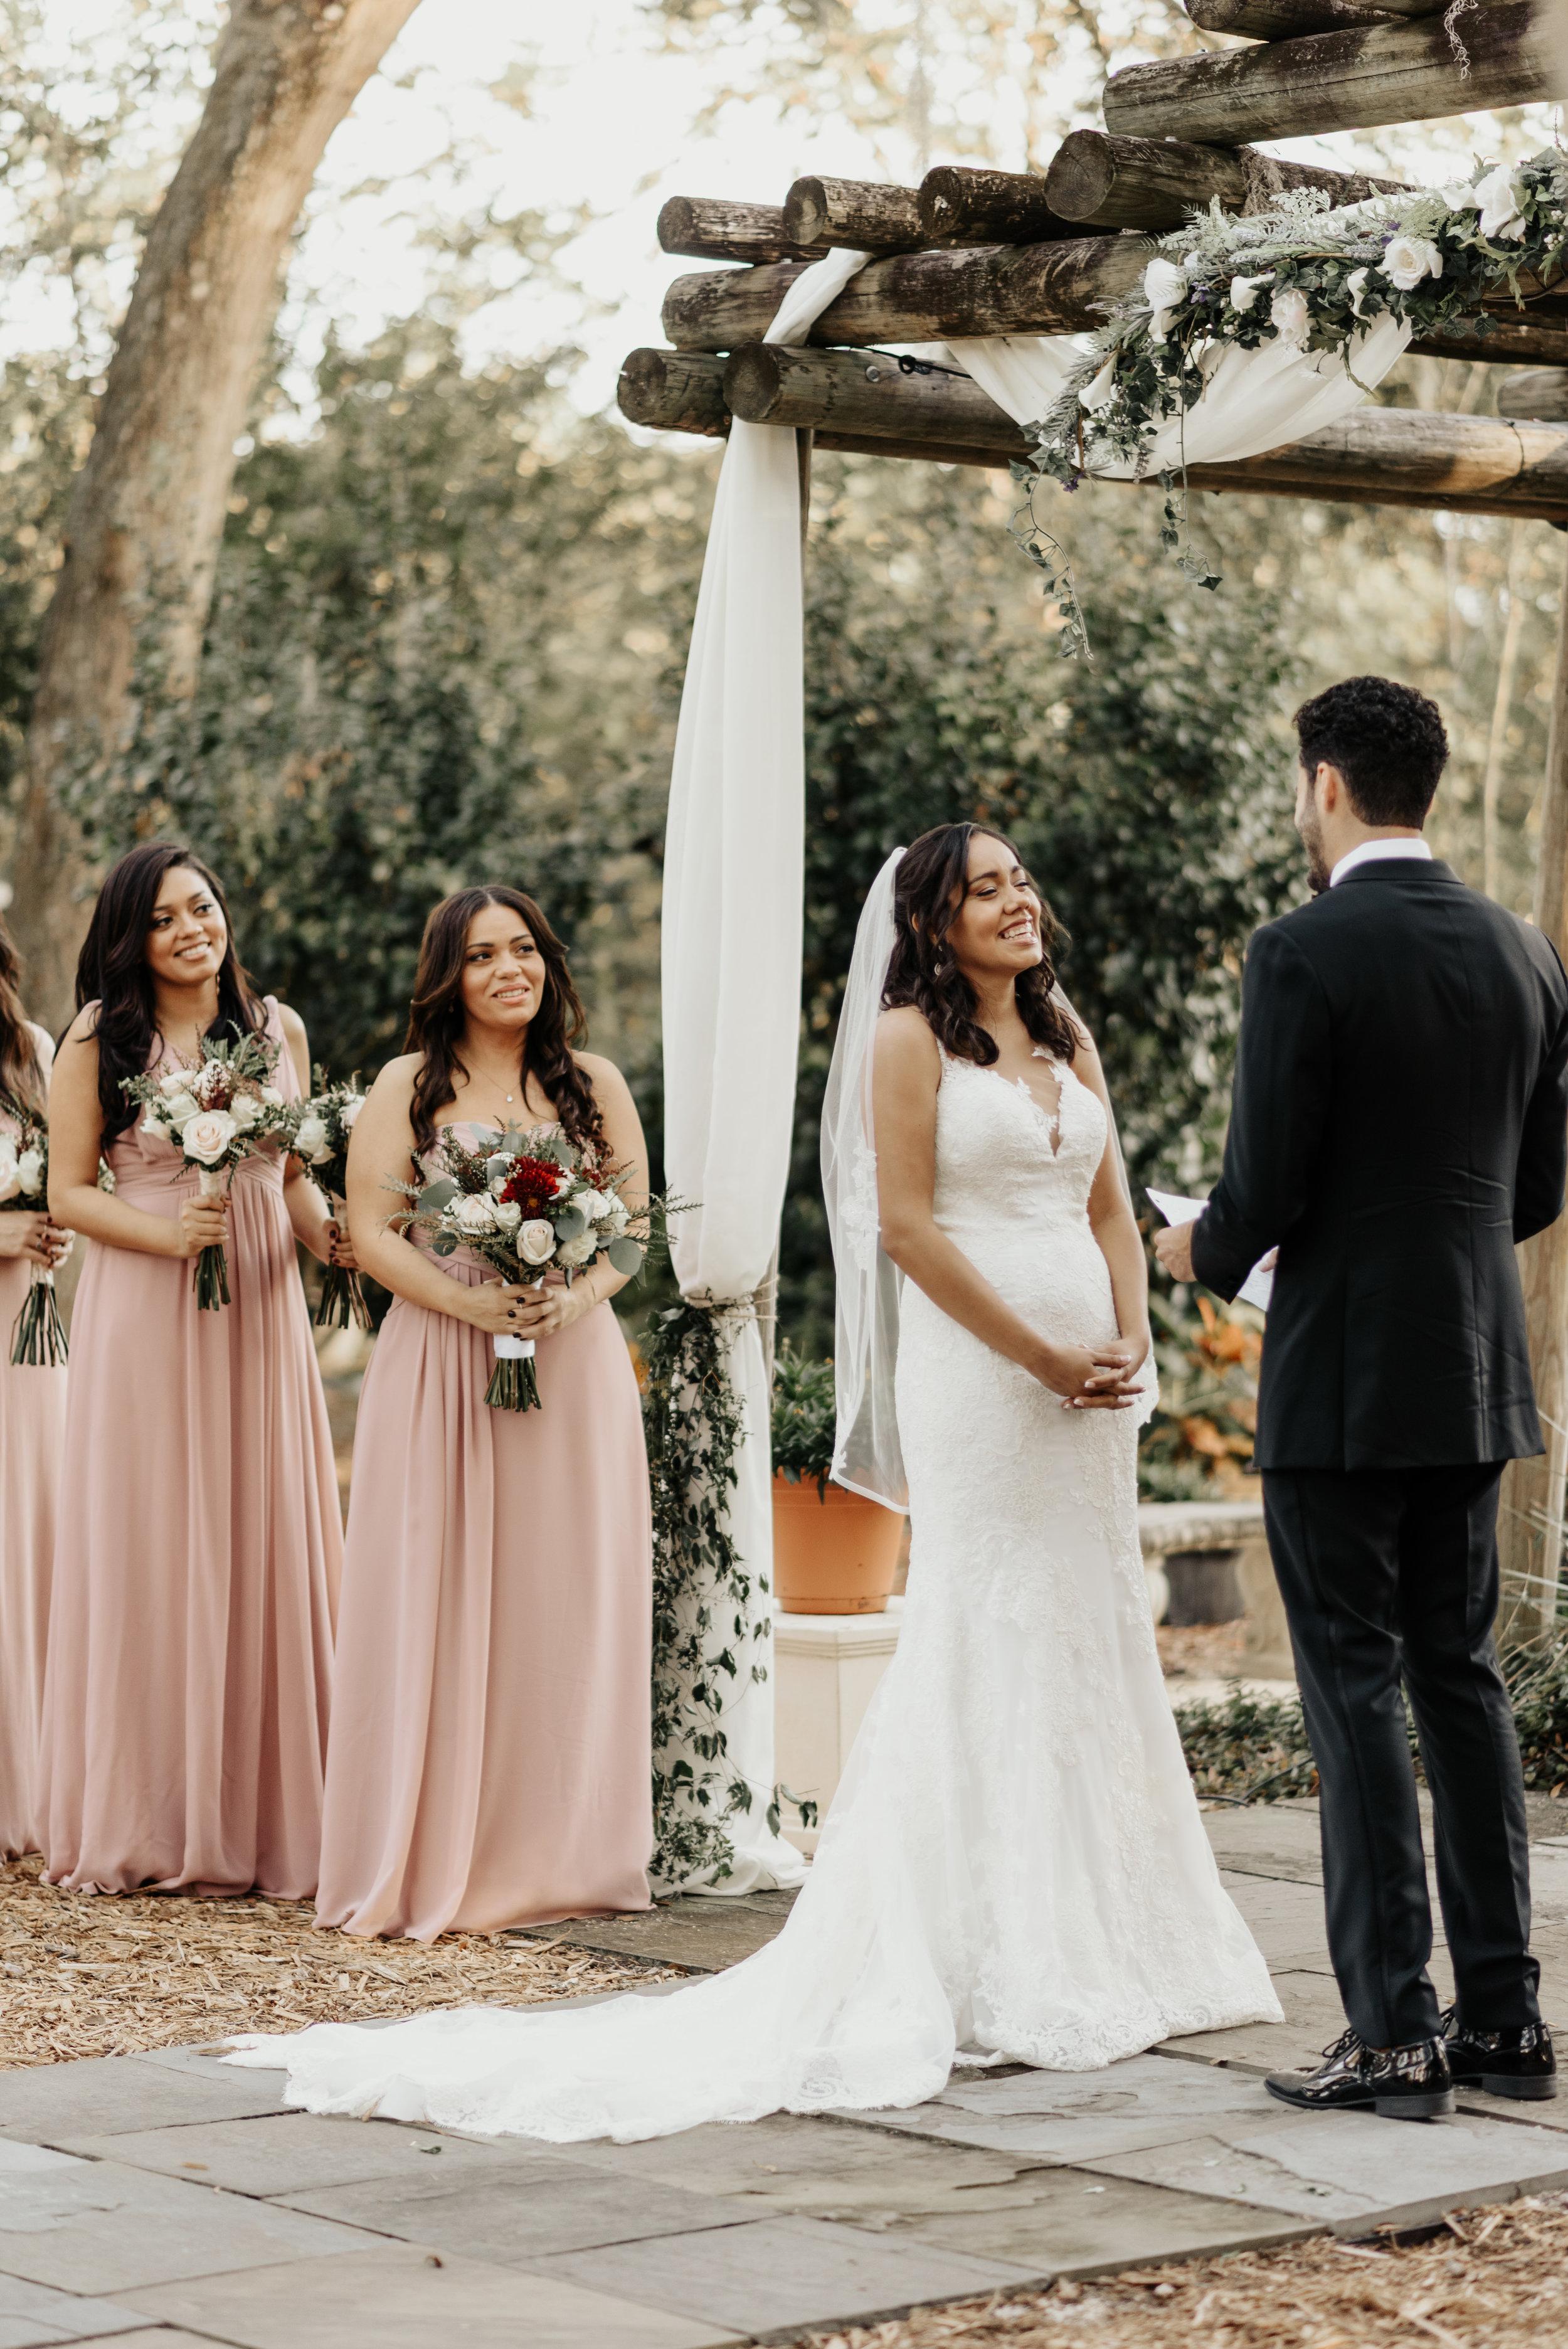 Kirstie-AJ-Wedding-9967.jpg